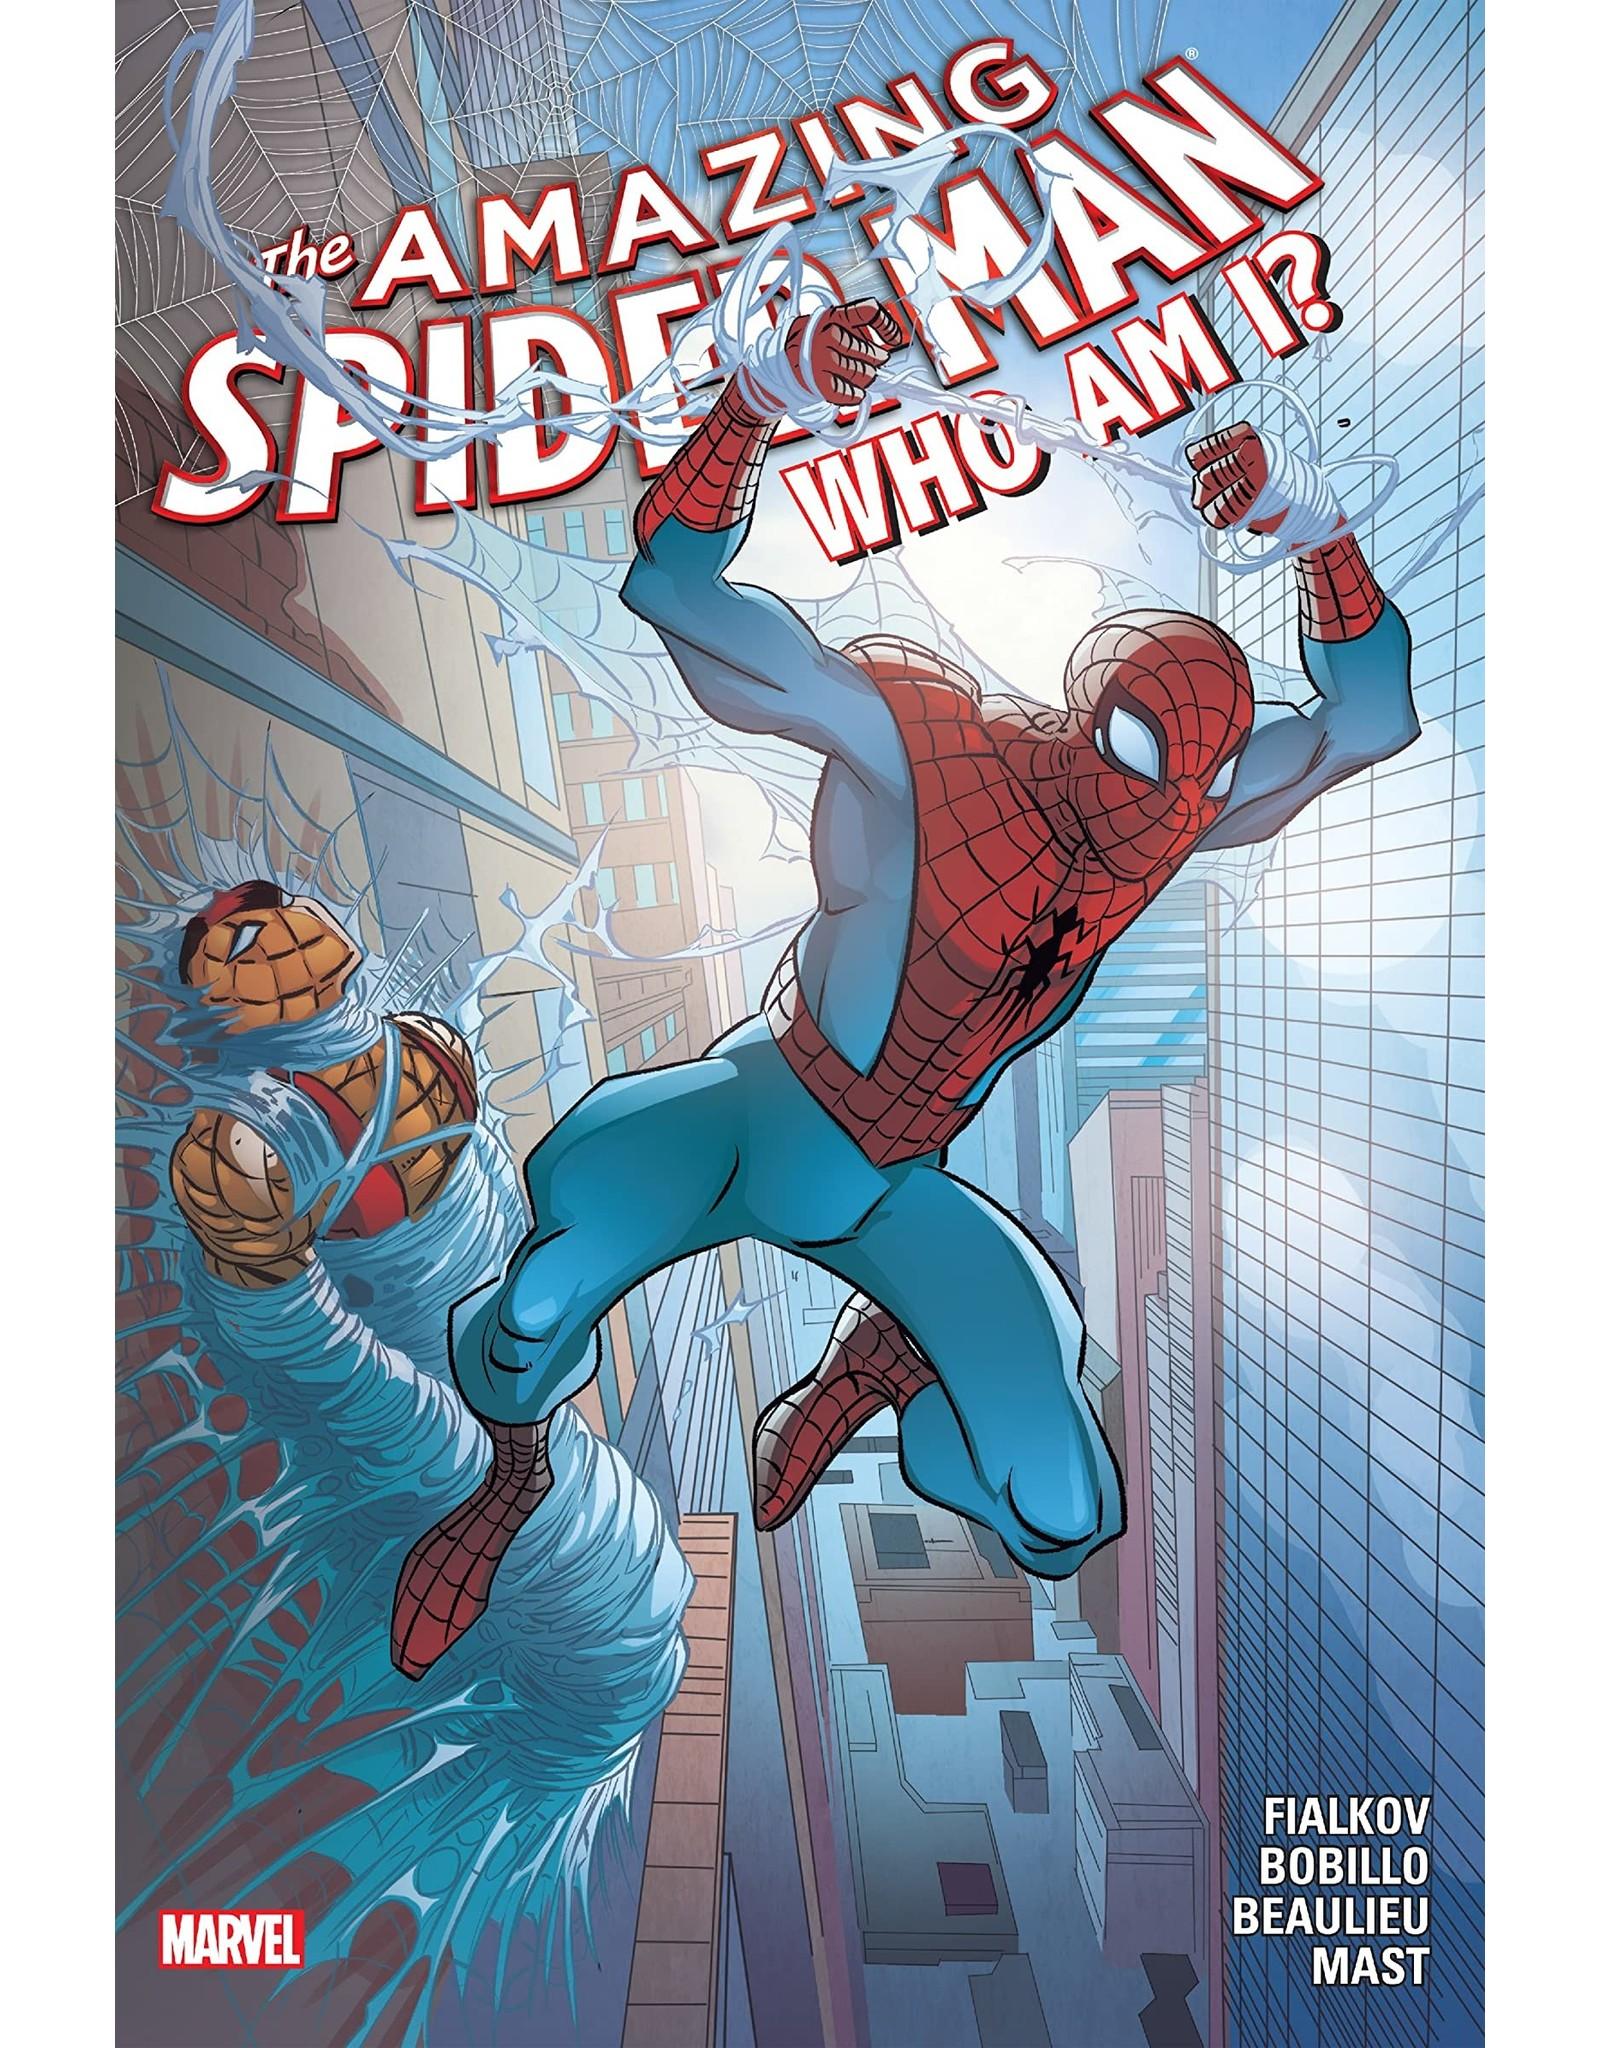 MARVEL COMICS AMAZING SPIDER-MAN HC WHO AM I